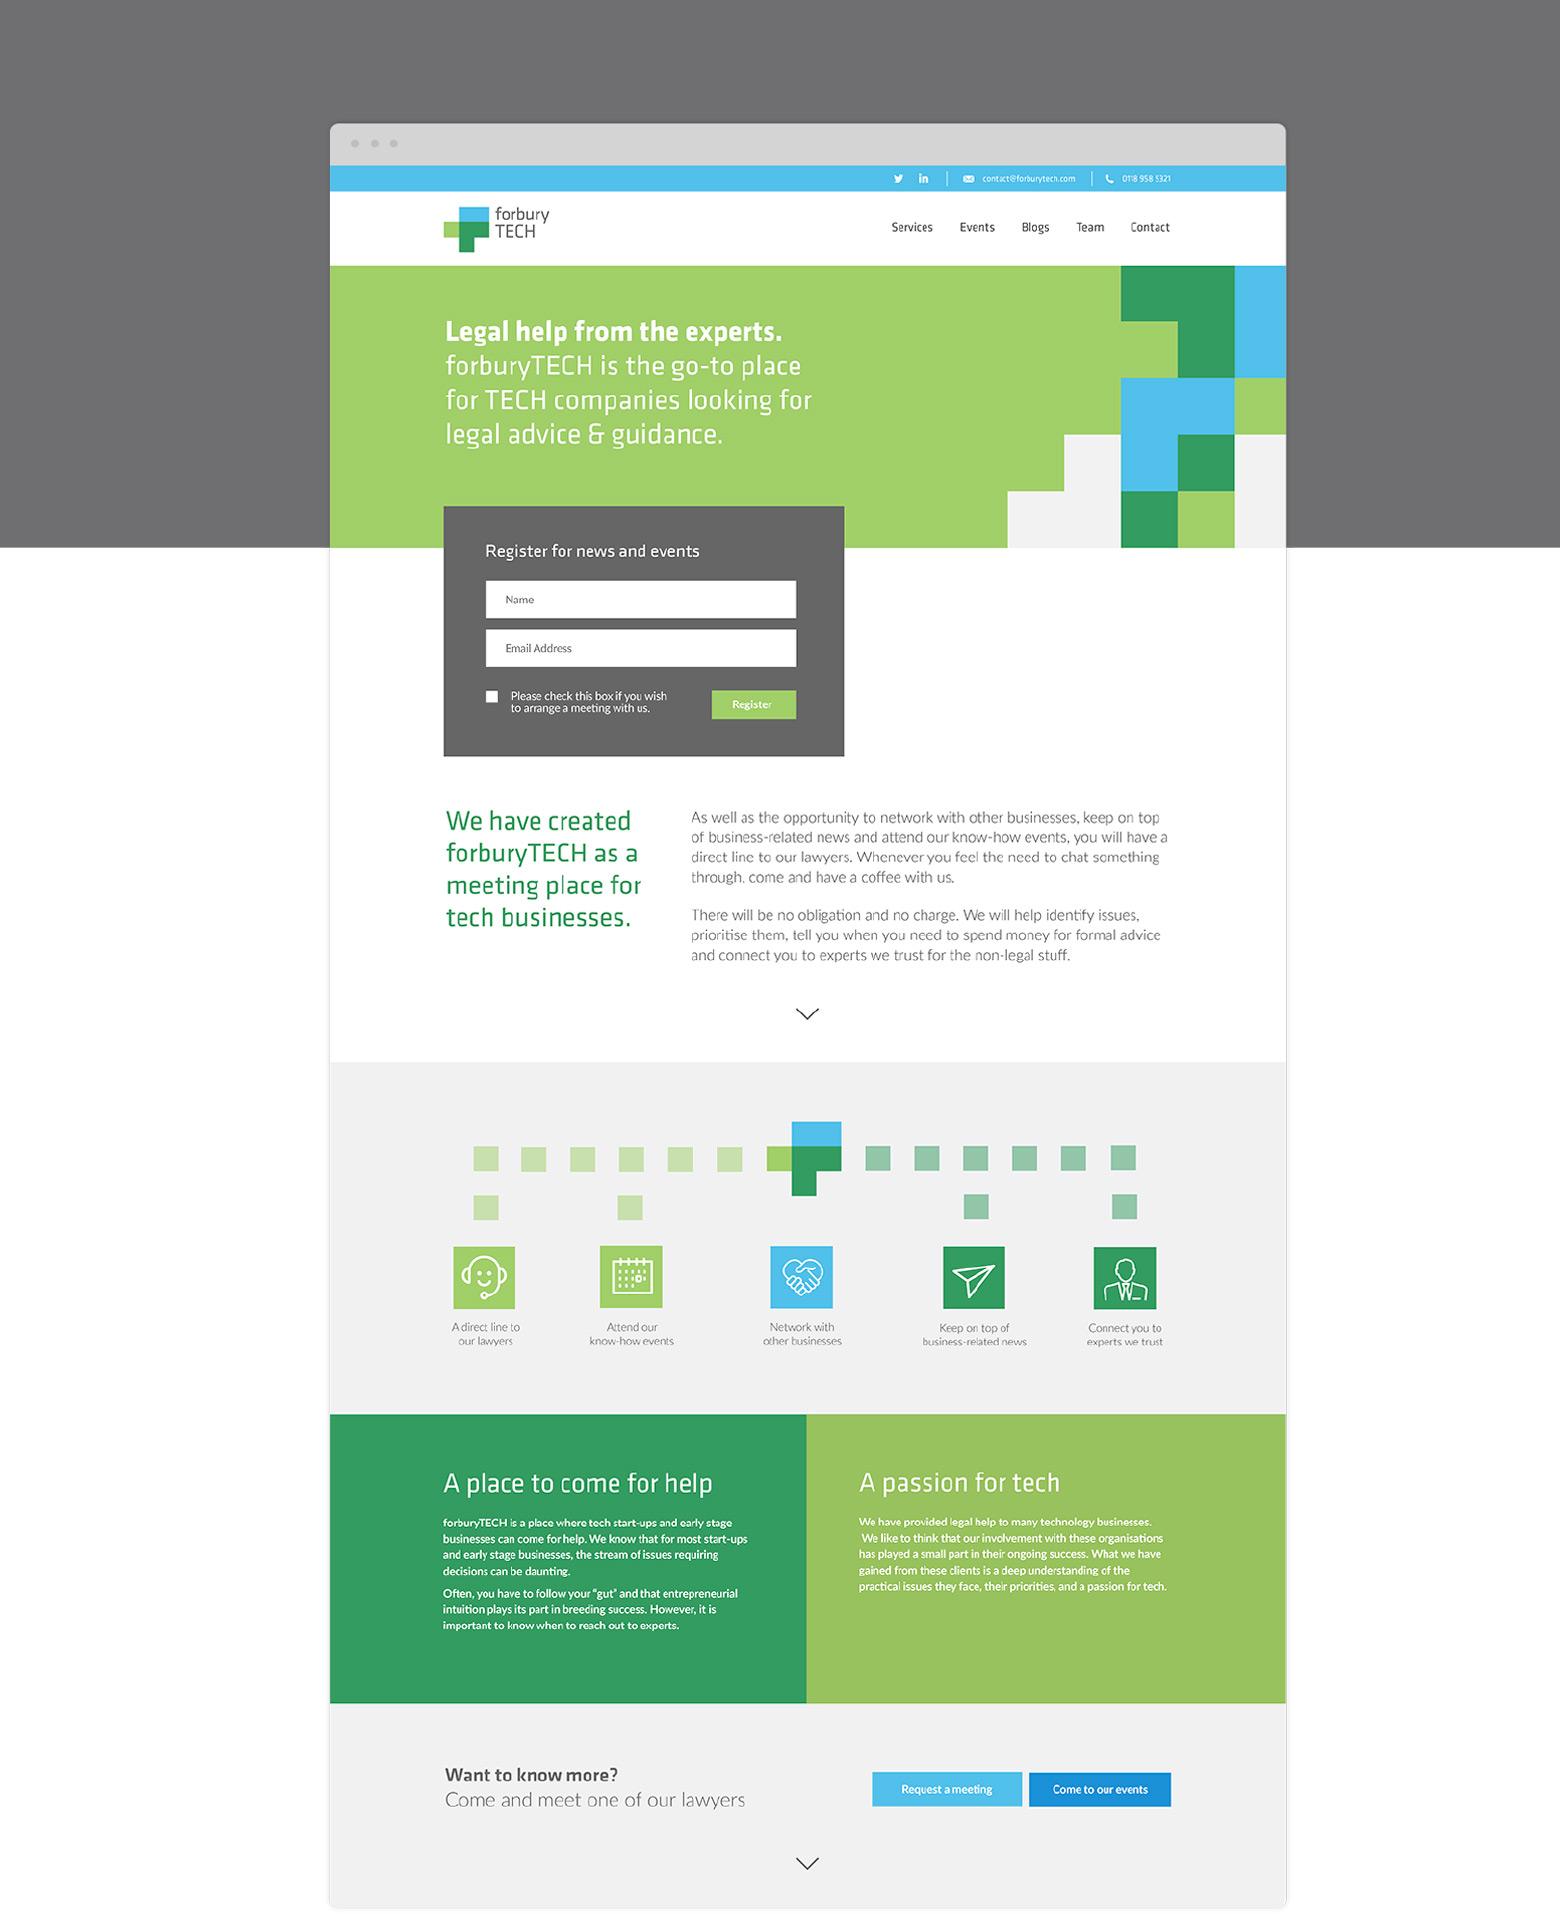 Forbury TECH webpage design